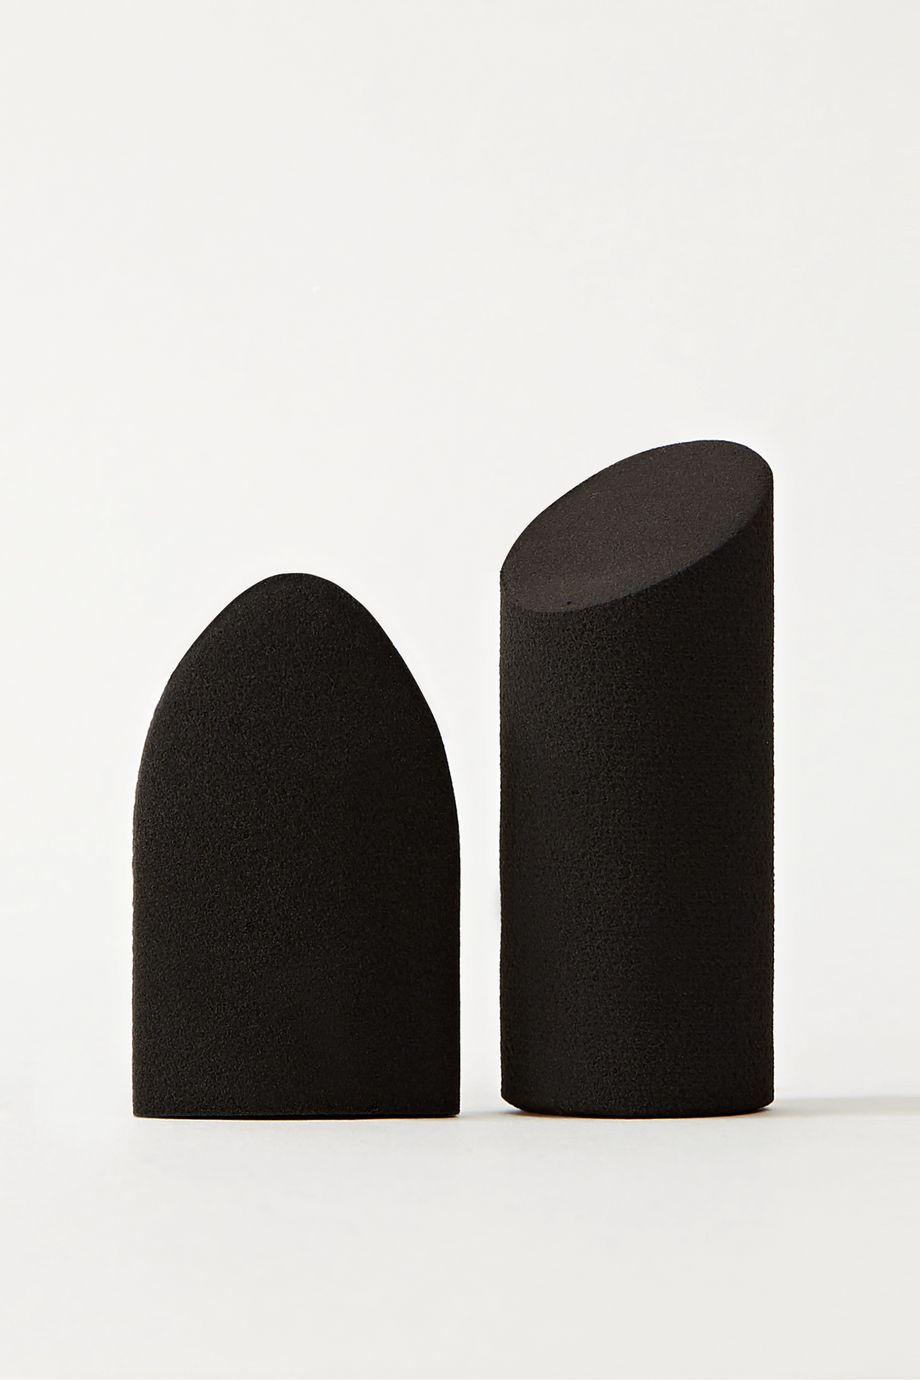 Serge Lutens The Detail Oriented - High Precision Sponge Set